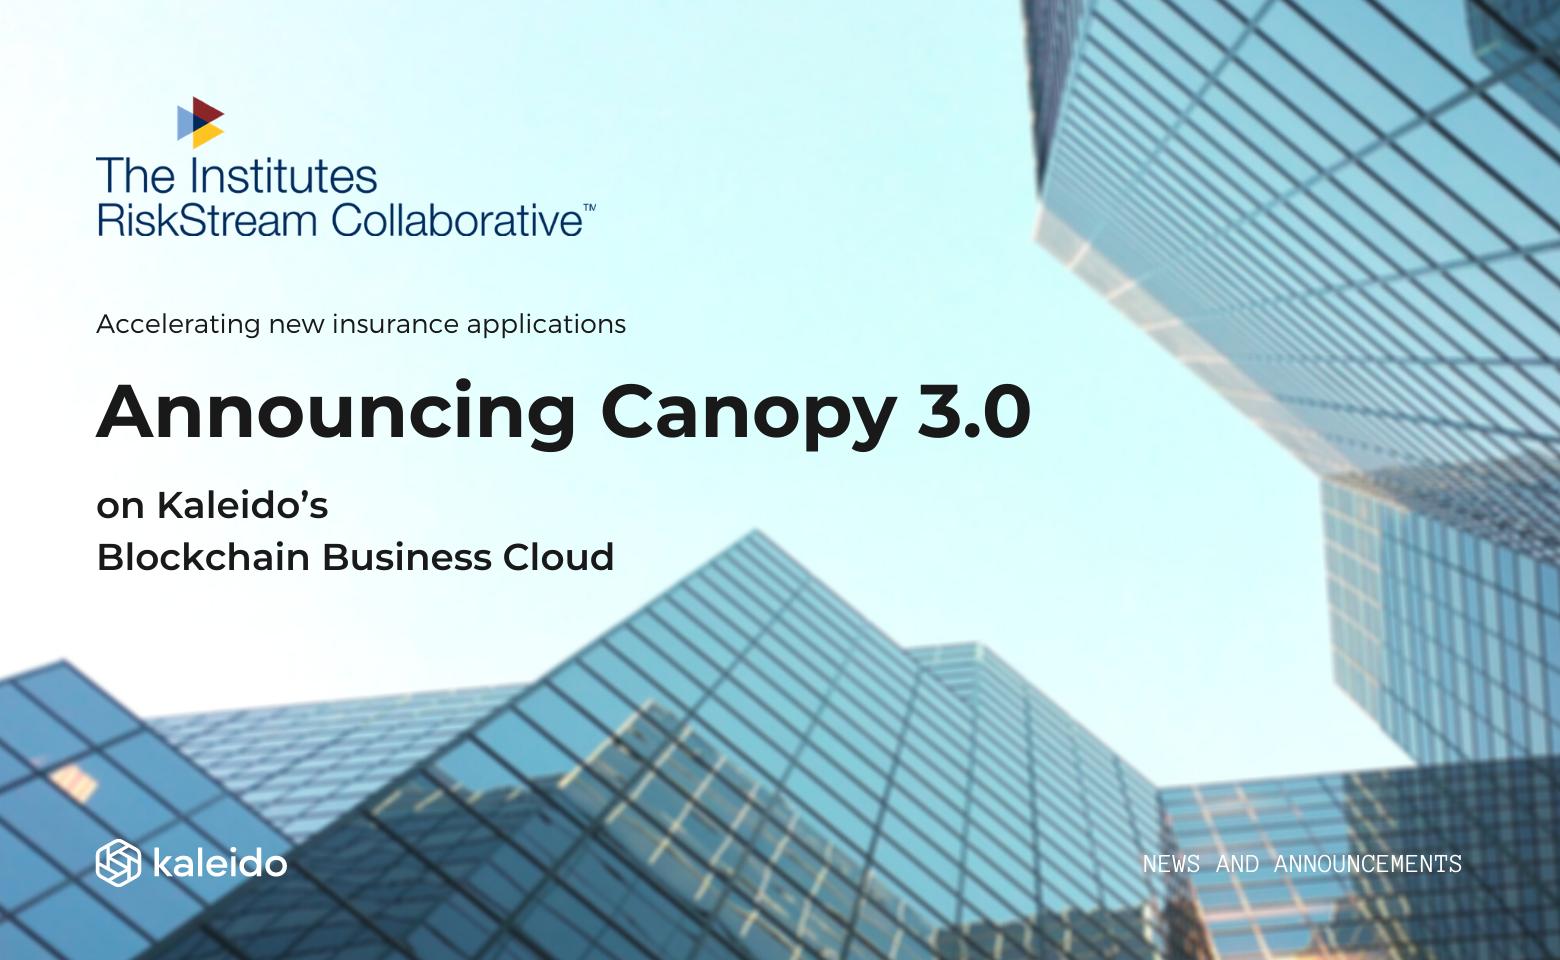 RiskStream Collaborative's Canopy 3.0 on Kaleido